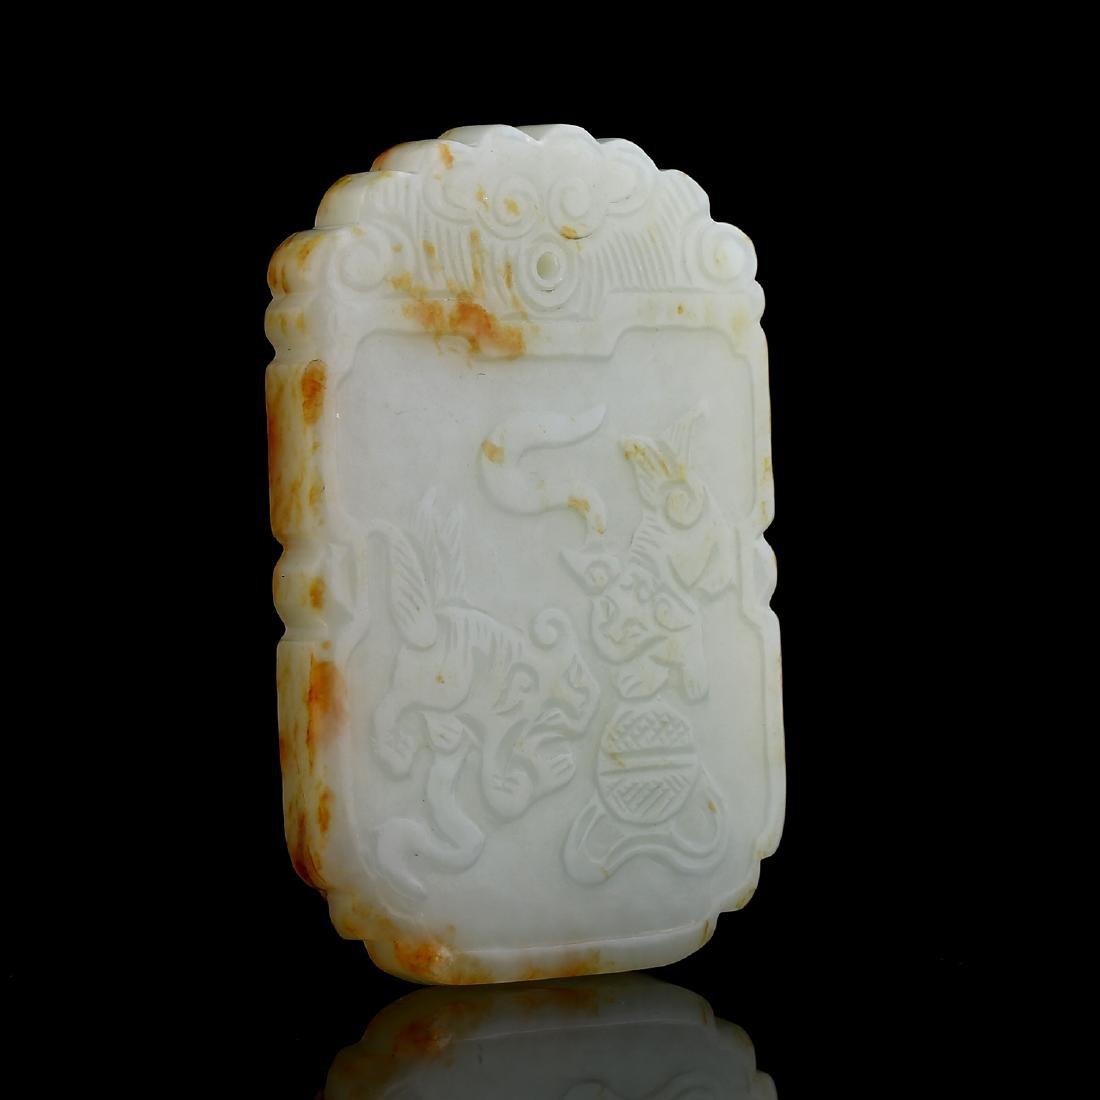 Chinese Qing Dynasty Hetian White Jade Pendant - 4